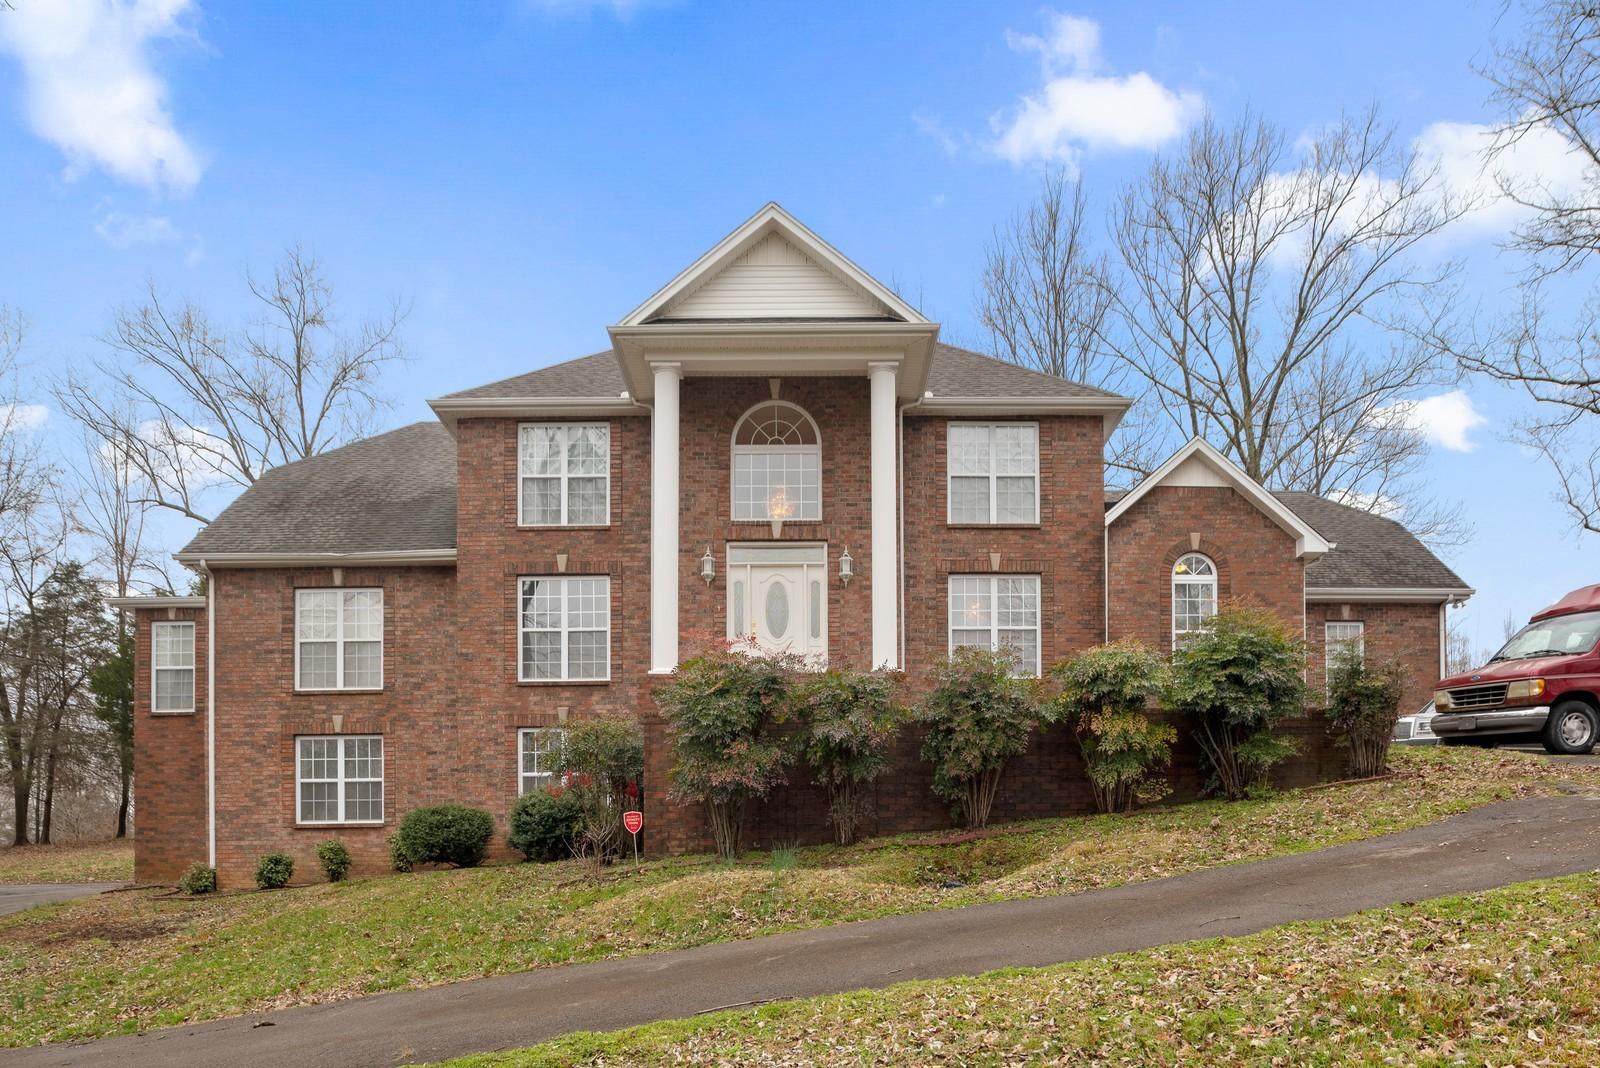 1007 Deer Branch Ln Property Photo - Greenbrier, TN real estate listing